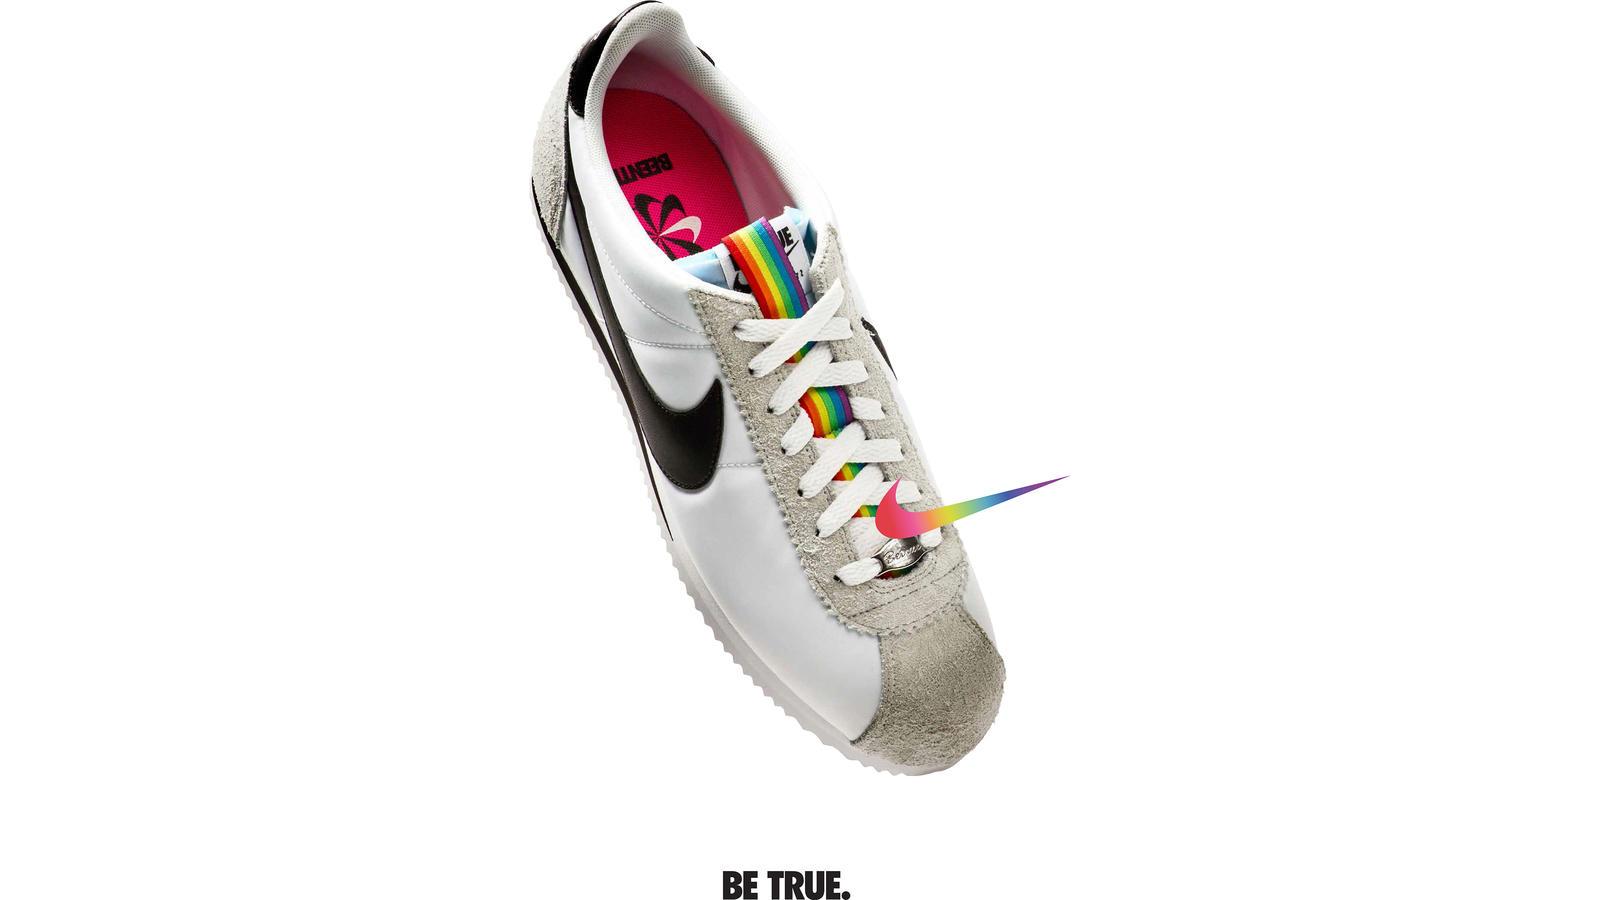 7029e8c4cf BETRUE 2017 30. Nike Classic Cortez BETRUE